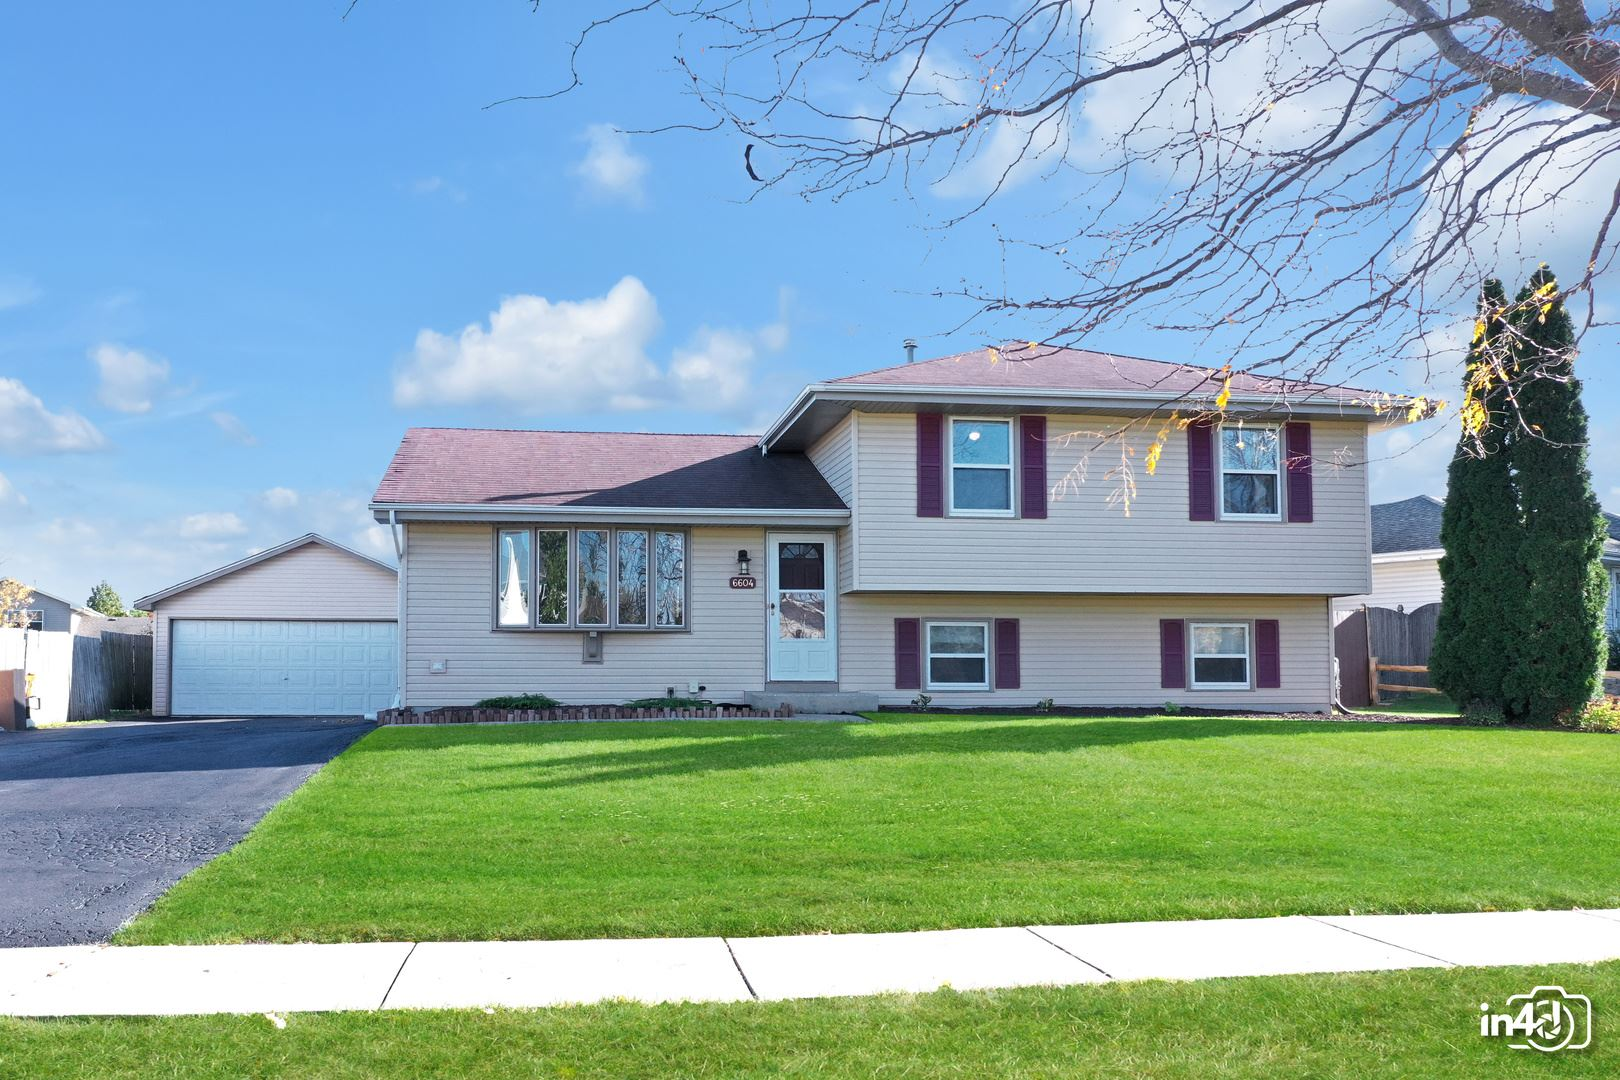 Photo of 6604 Benich Lane, Plainfield, IL 60586 (MLS # 10895489)